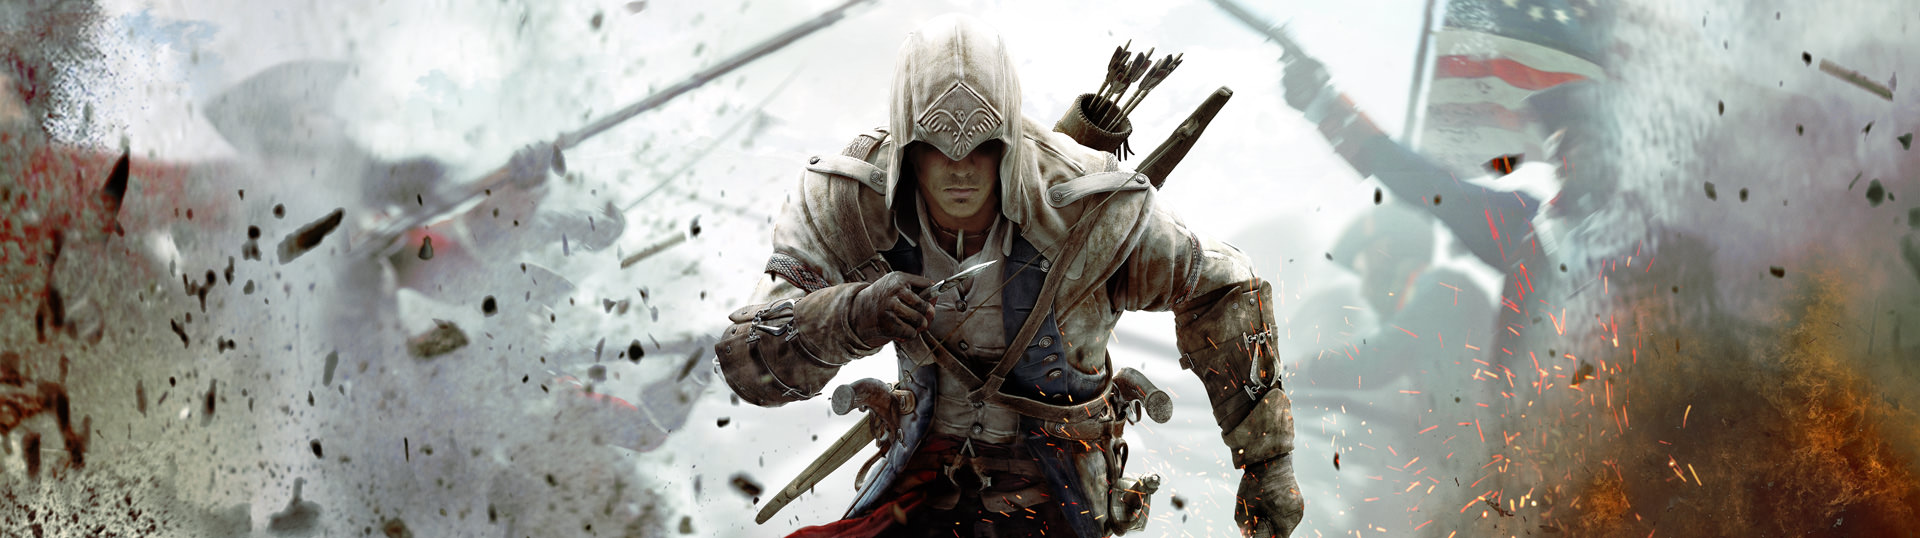 Buy Assassins Creed 3 The Hidden Secrets Pack PC Uplay CD